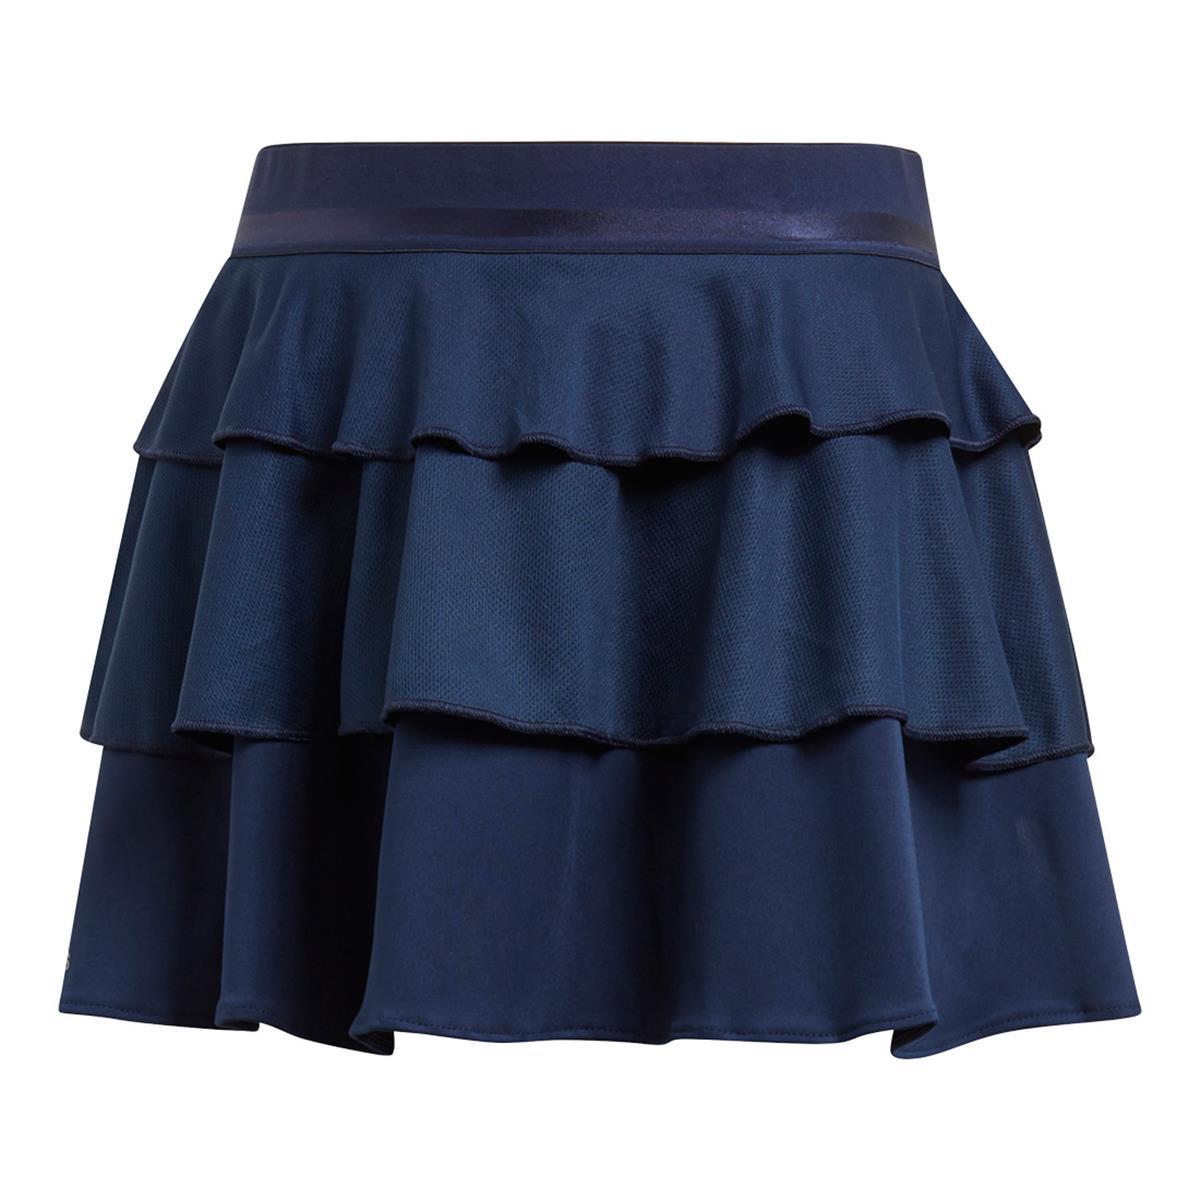 sale retailer 00c6e e5d99 Adidas Frilly Girls Skirt (Navy)